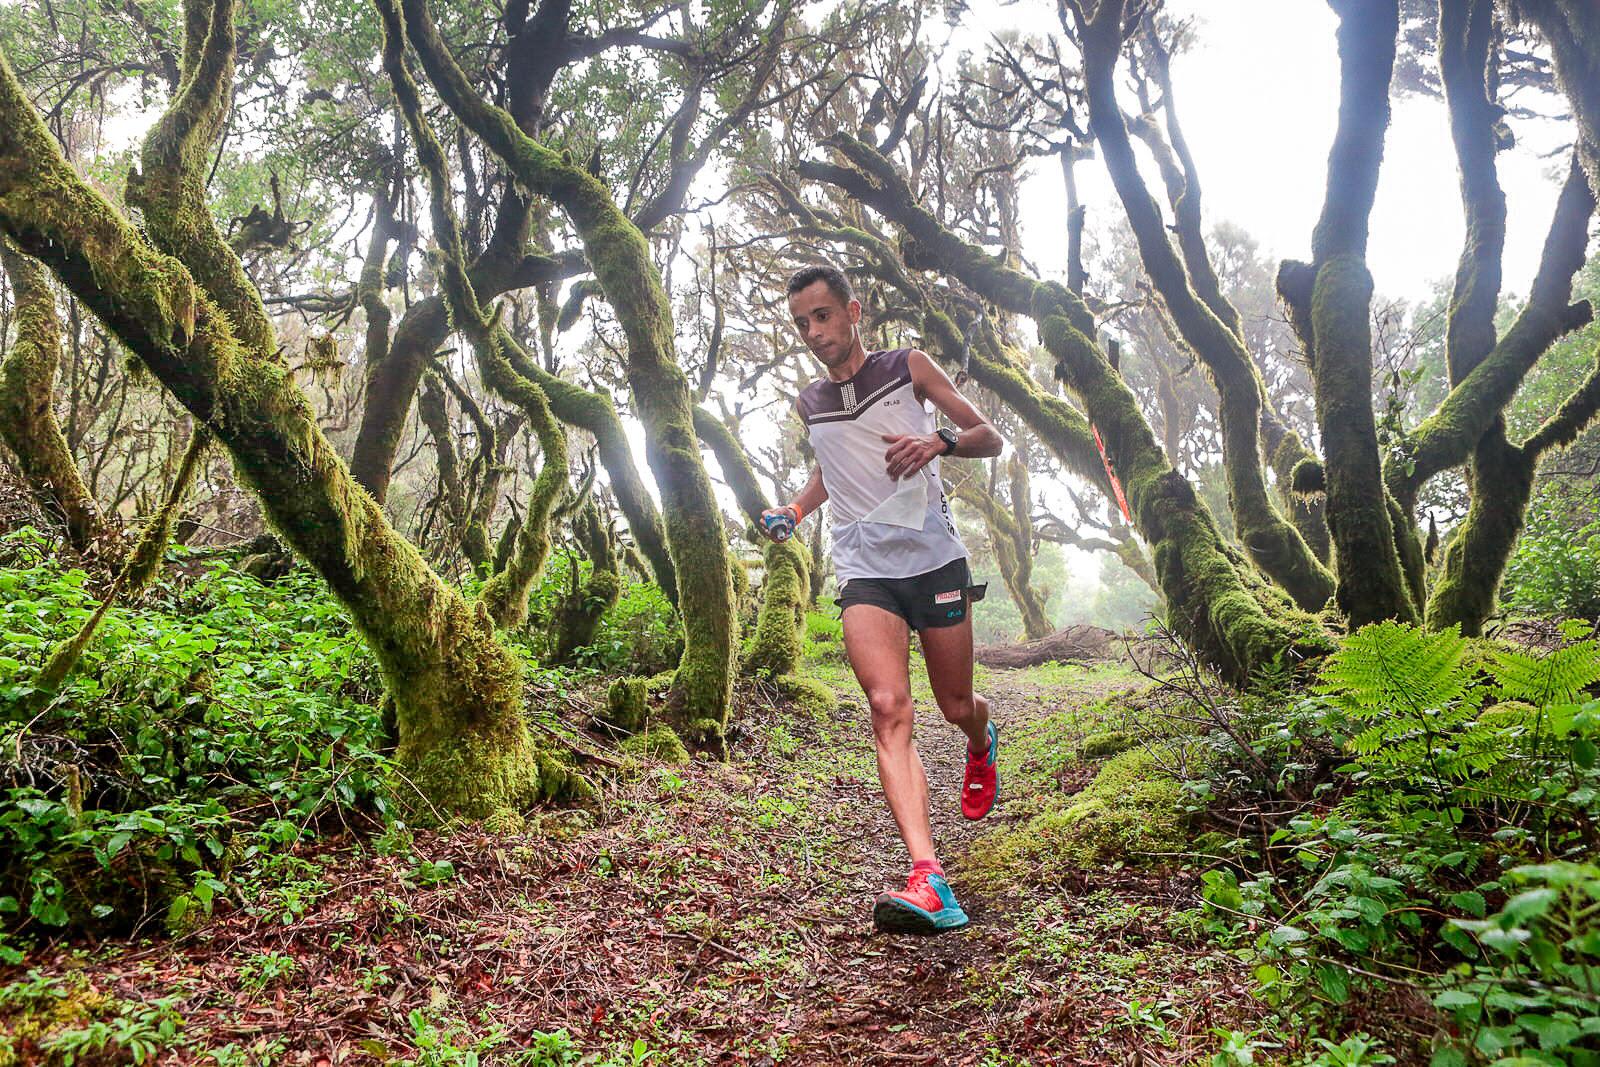 Cristofer Clemente debuta en las Golden Trail National Series